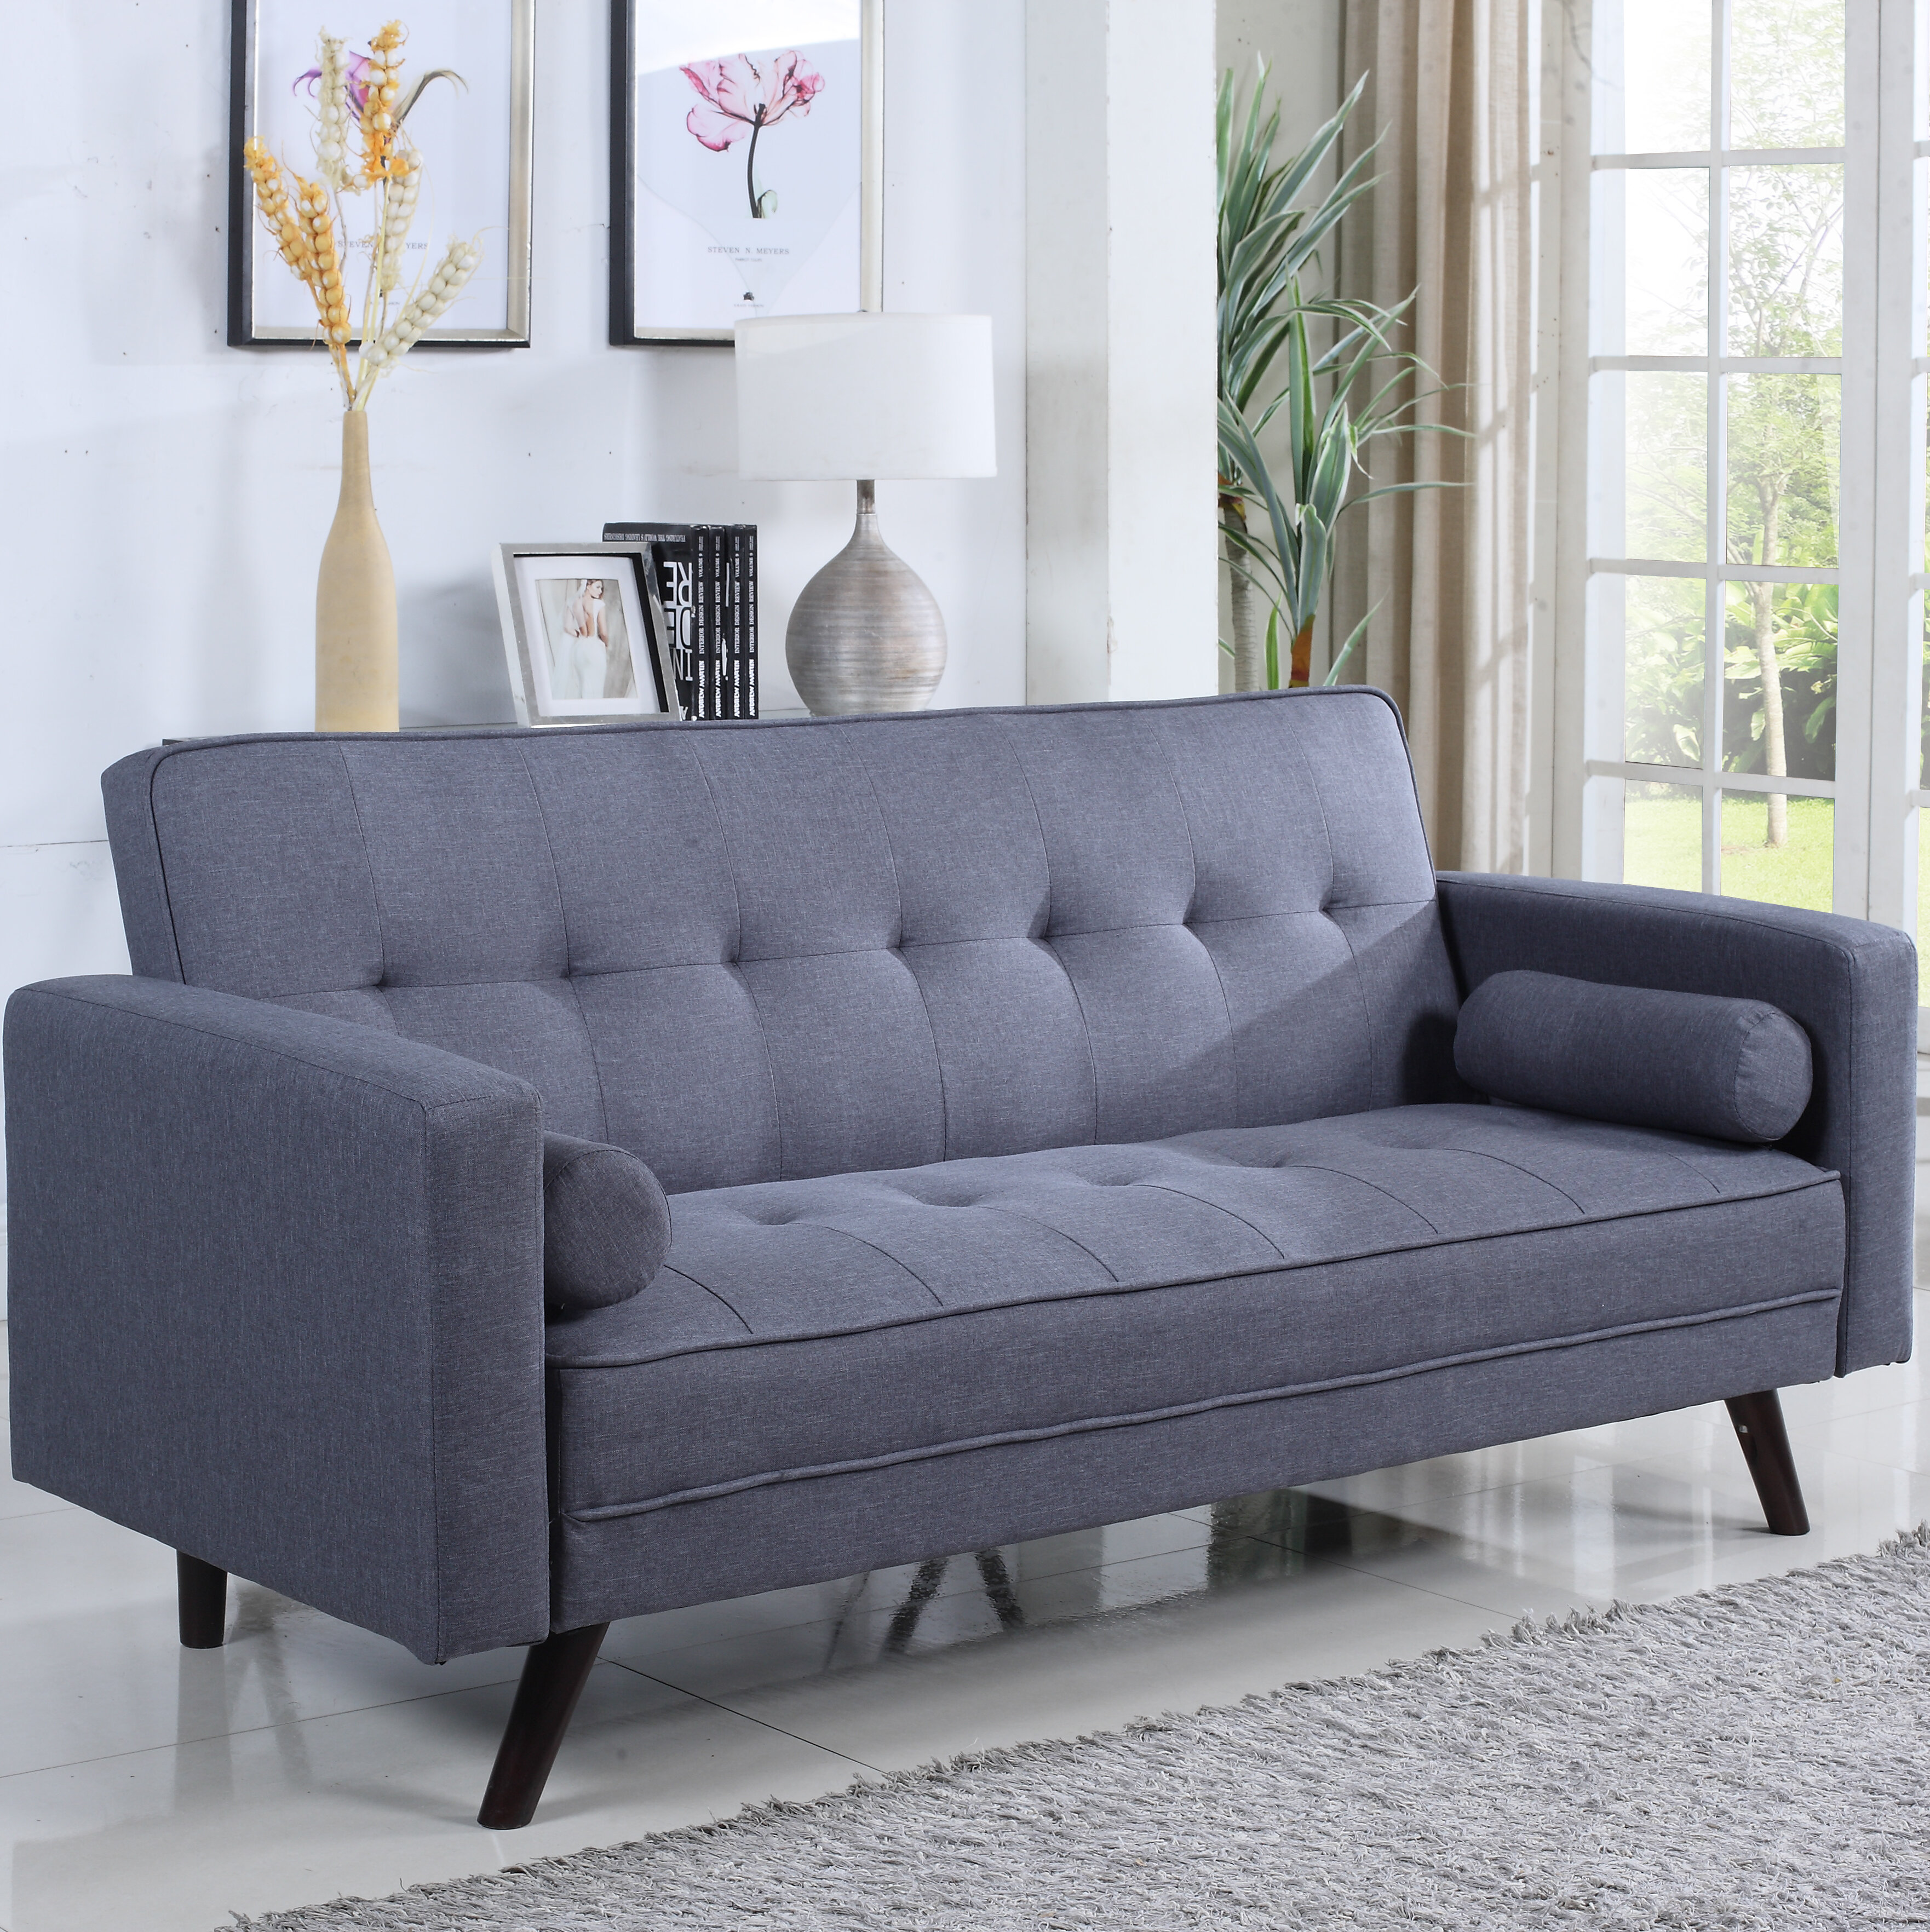 Merveilleux Langley Street Santa Clara Sleeper Sofa U0026 Reviews | Wayfair